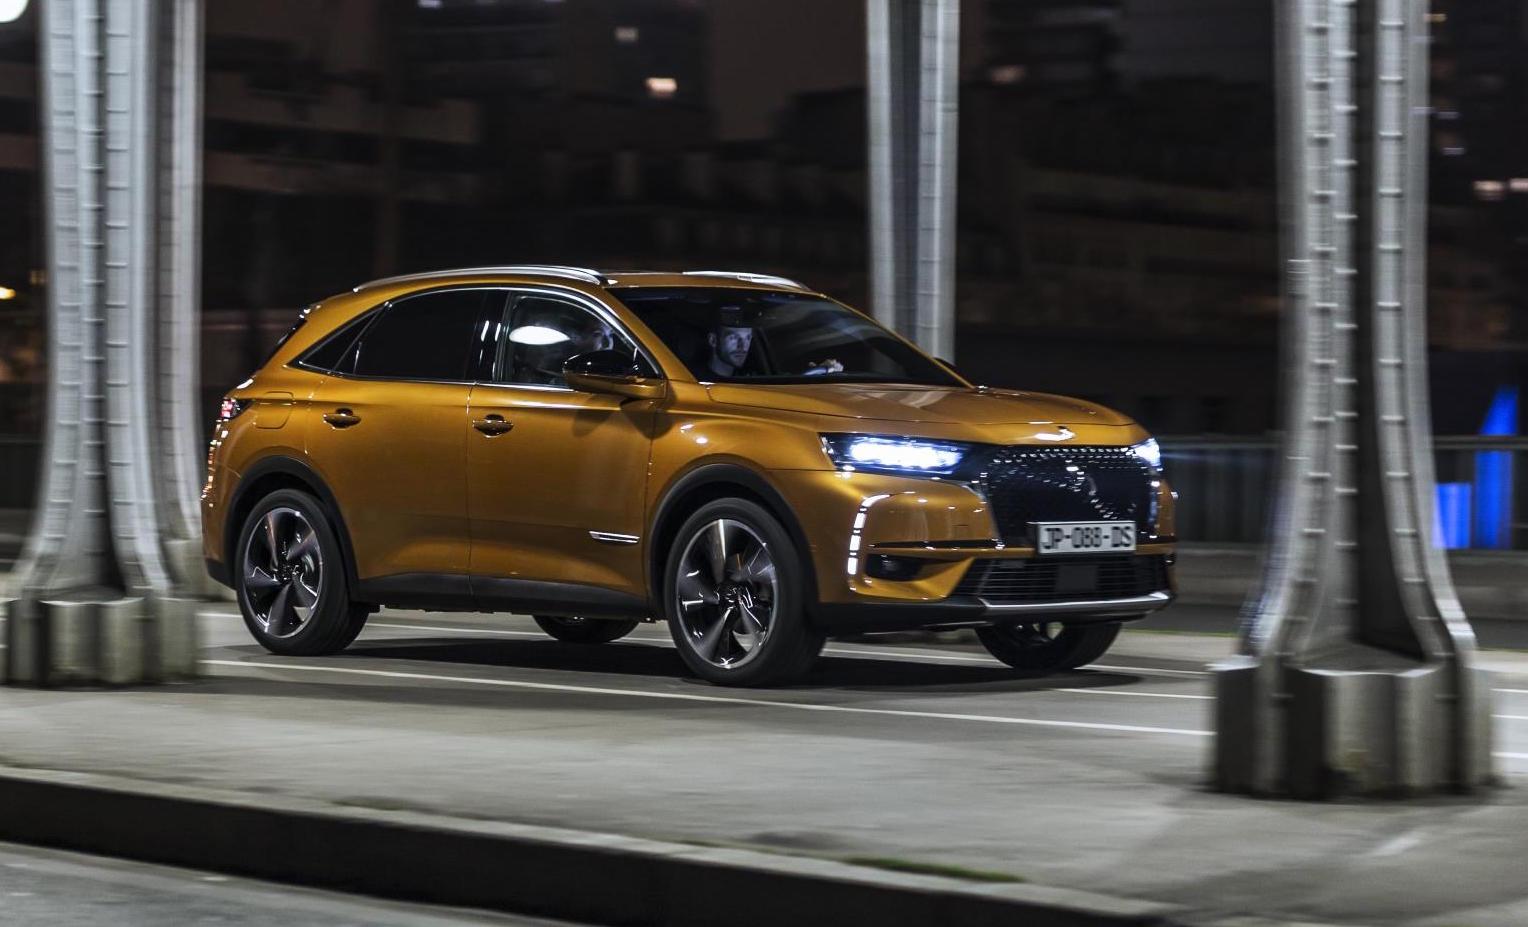 2019 Hybrid Cars Australia | Nissan 2019 Cars